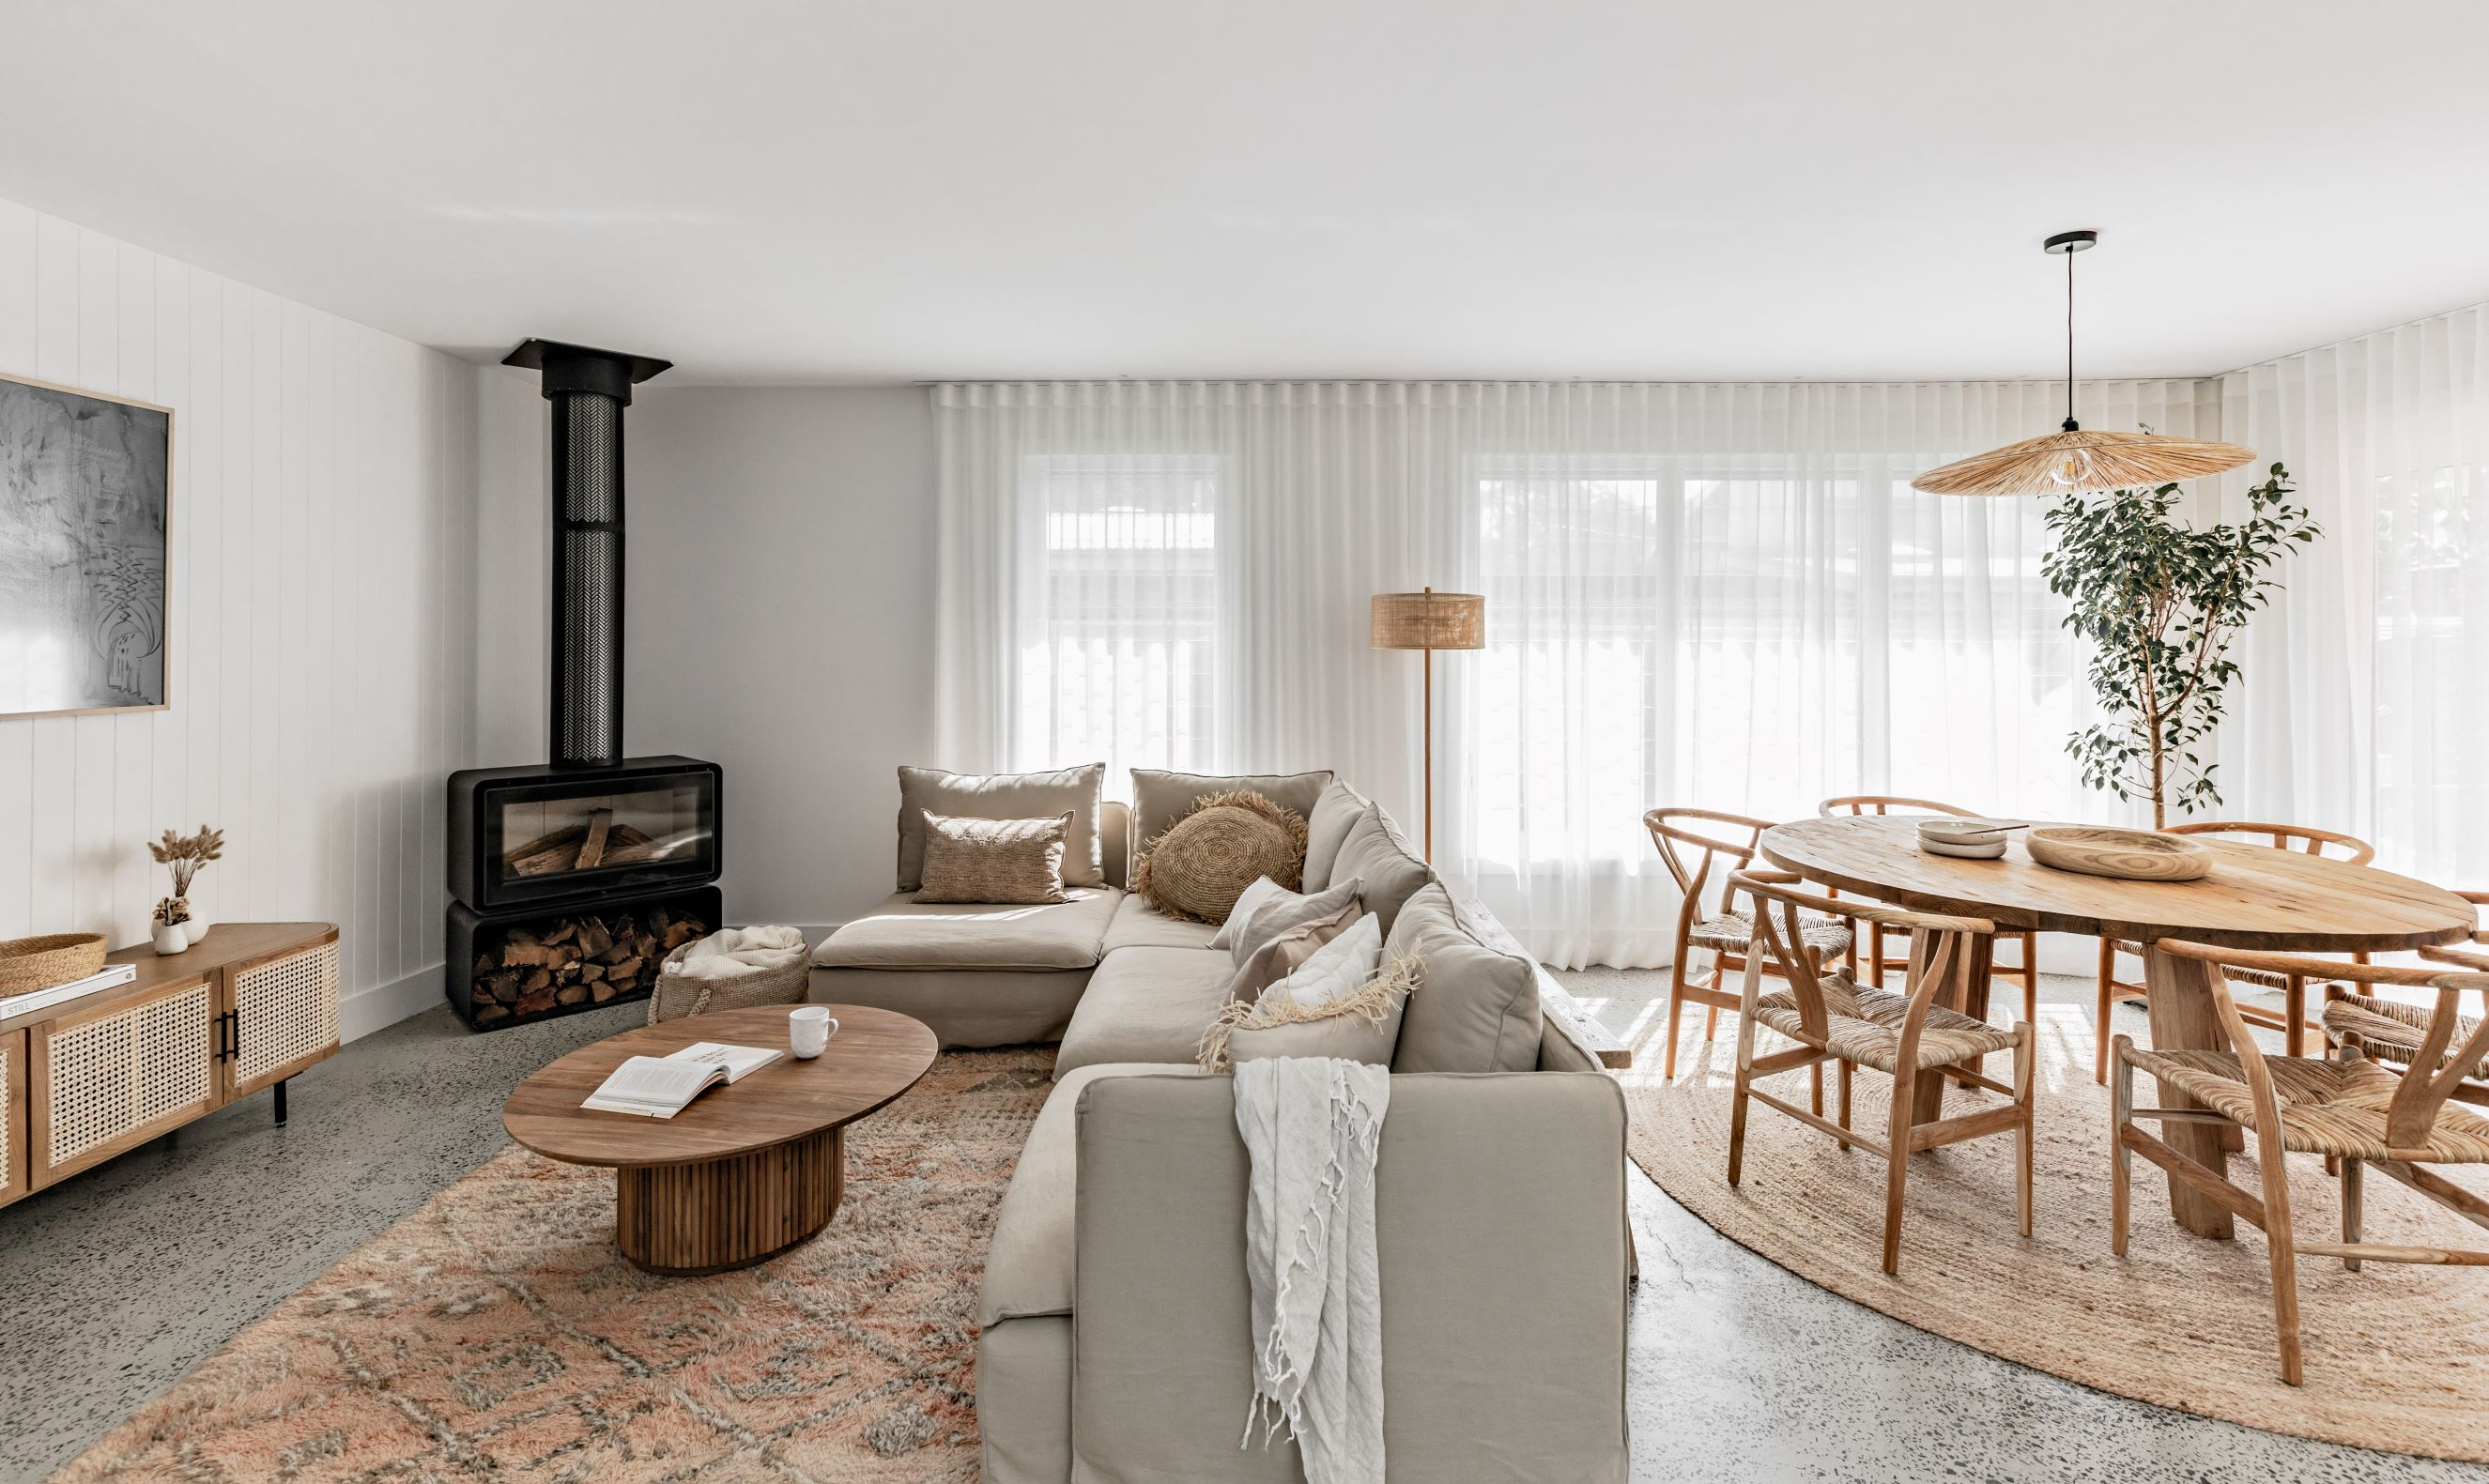 berkeley-vale-cottage-ama-studio-interiors-renovation-dining-living-room